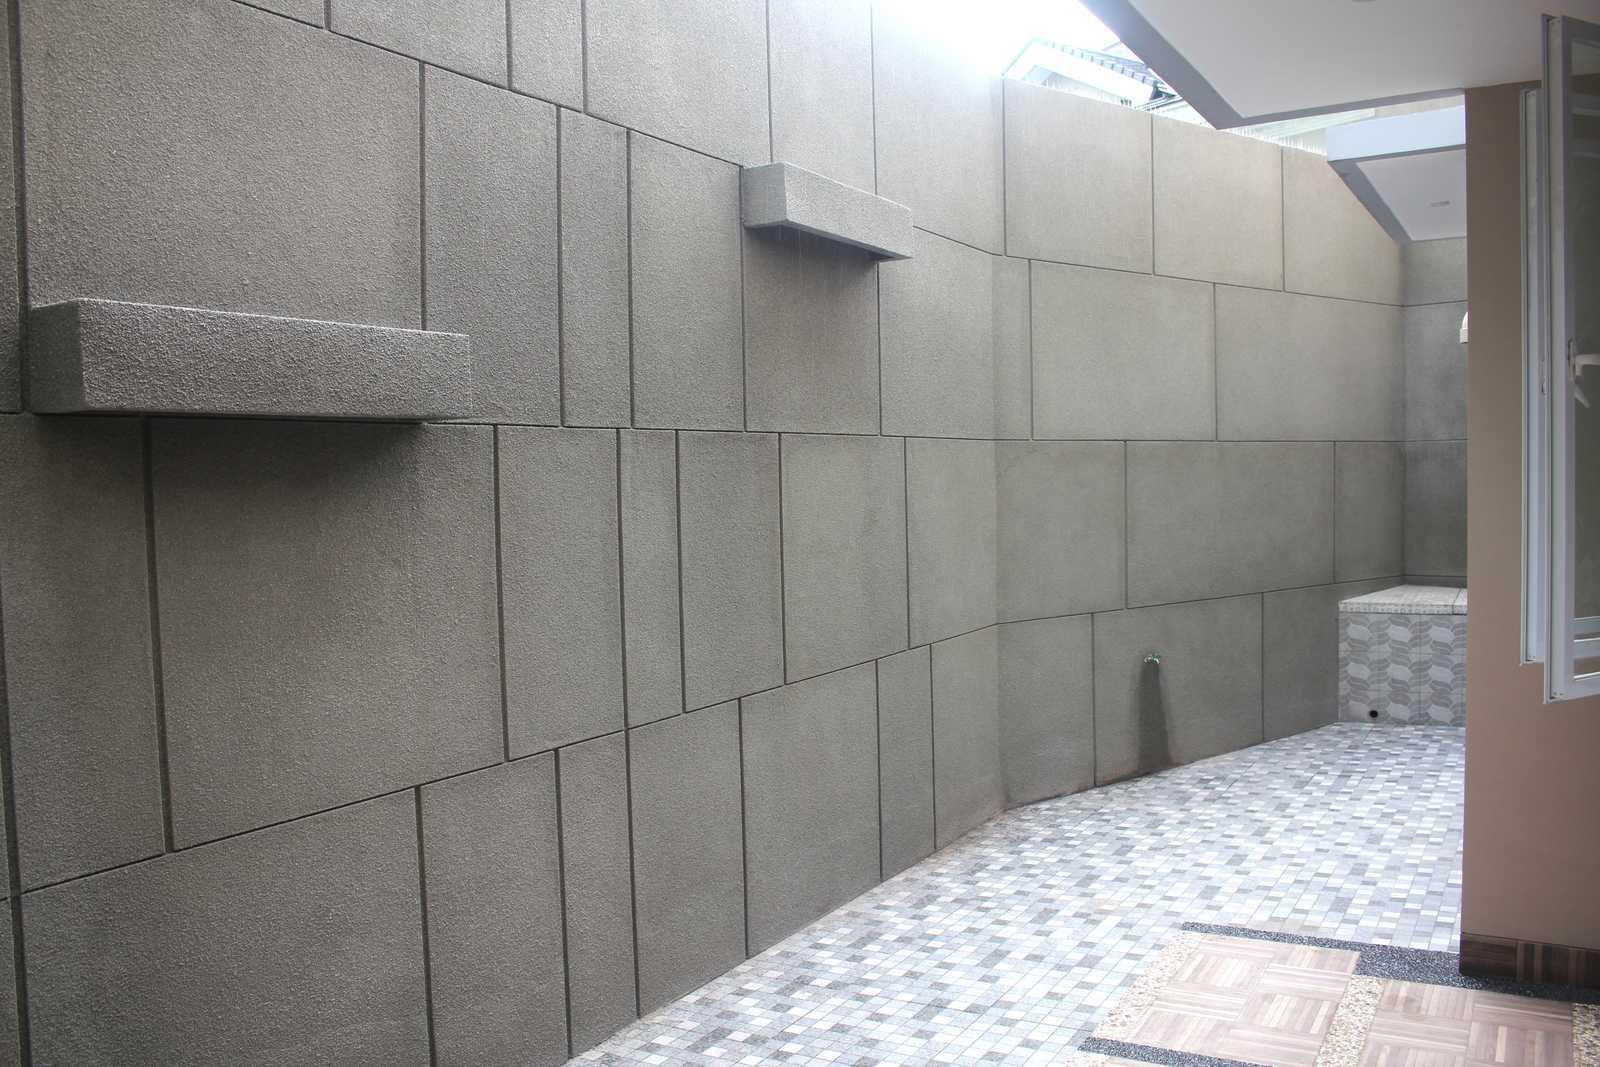 X3M Architects Beringin Golf Residence Jl. Cendana Golf No.2, Bencongan, Klp. Dua, Tangerang, Banten 15810, Indonesia Jl. Cendana Golf No.2, Bencongan, Klp. Dua, Tangerang, Banten 15810, Indonesia Img3166   34175